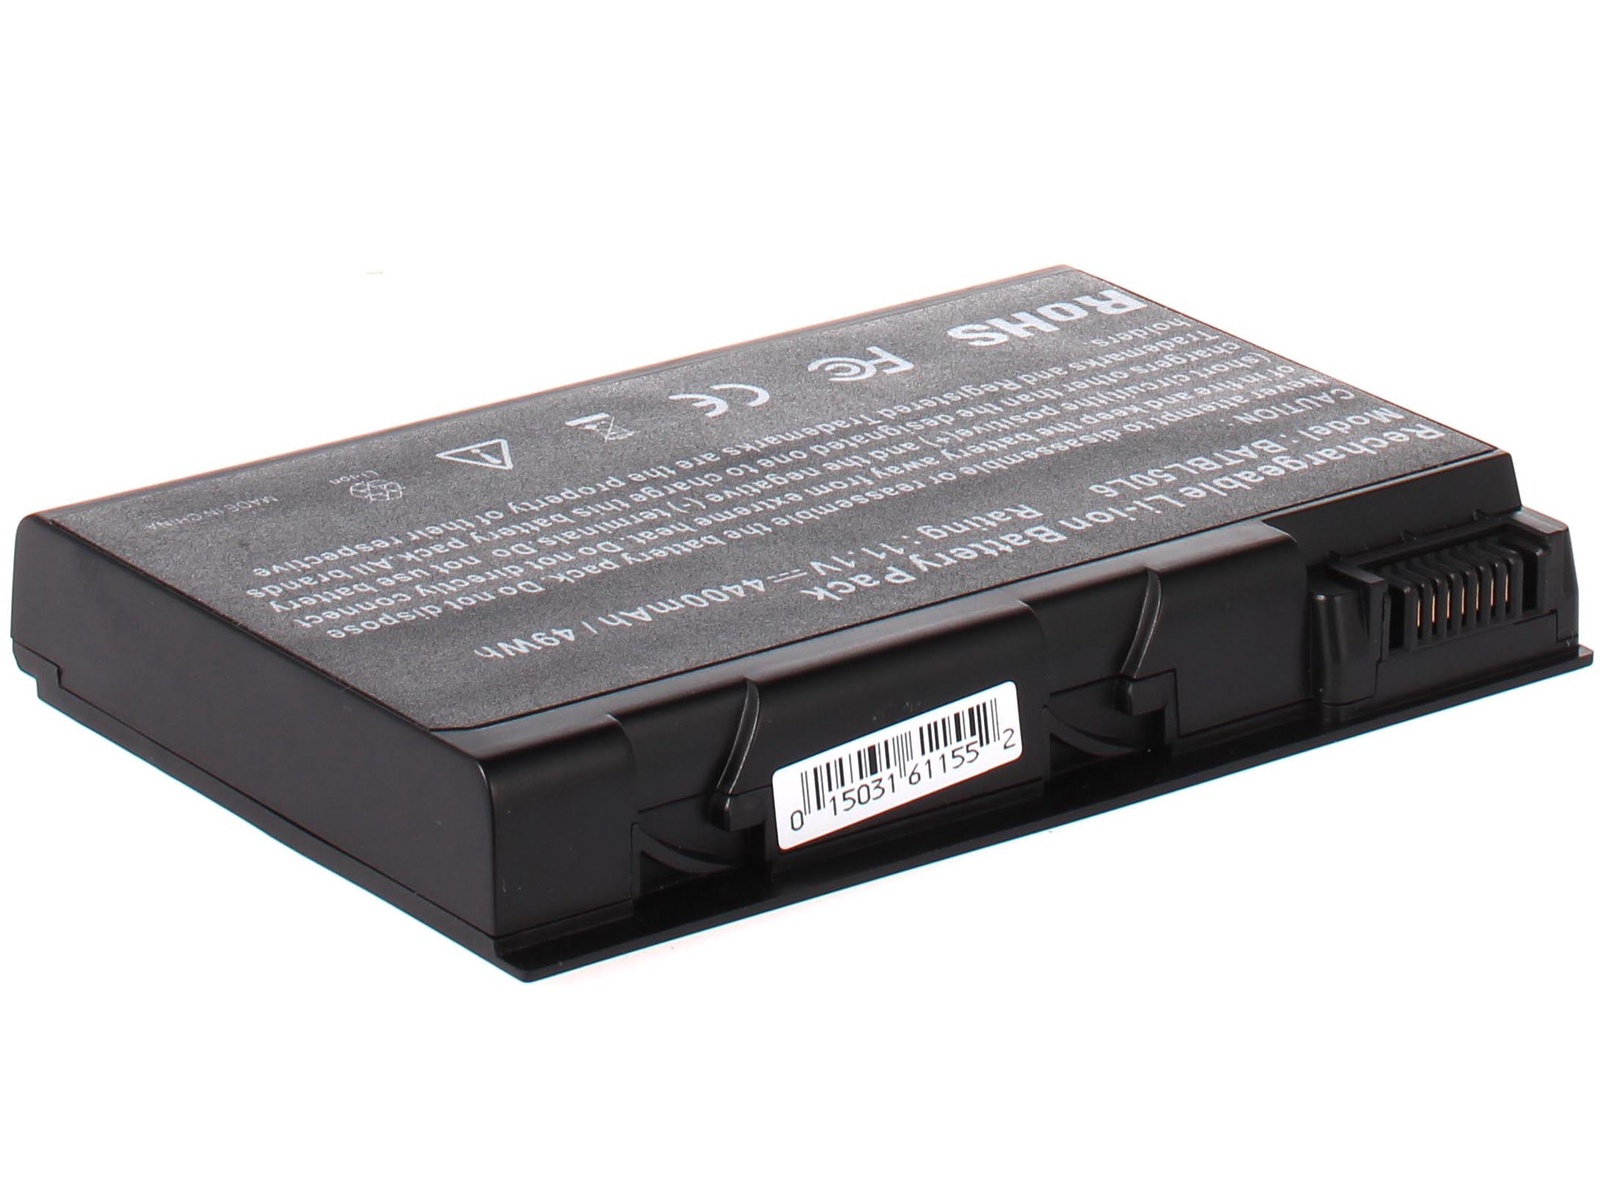 Аккумулятор для ноутбука AnyBatt для Acer Aspire 5612AWLMI, Aspire 5660, Aspire 5683WLMi, Aspire 9800WKMi, Aspire 9802AWKMiB, Aspire 9802WLMI, Aspire 9803, Aspire 9803WKMi, Aspire 9804WKHi, Aspire 9804WKMi, TravelMate 2492NWLMi цена